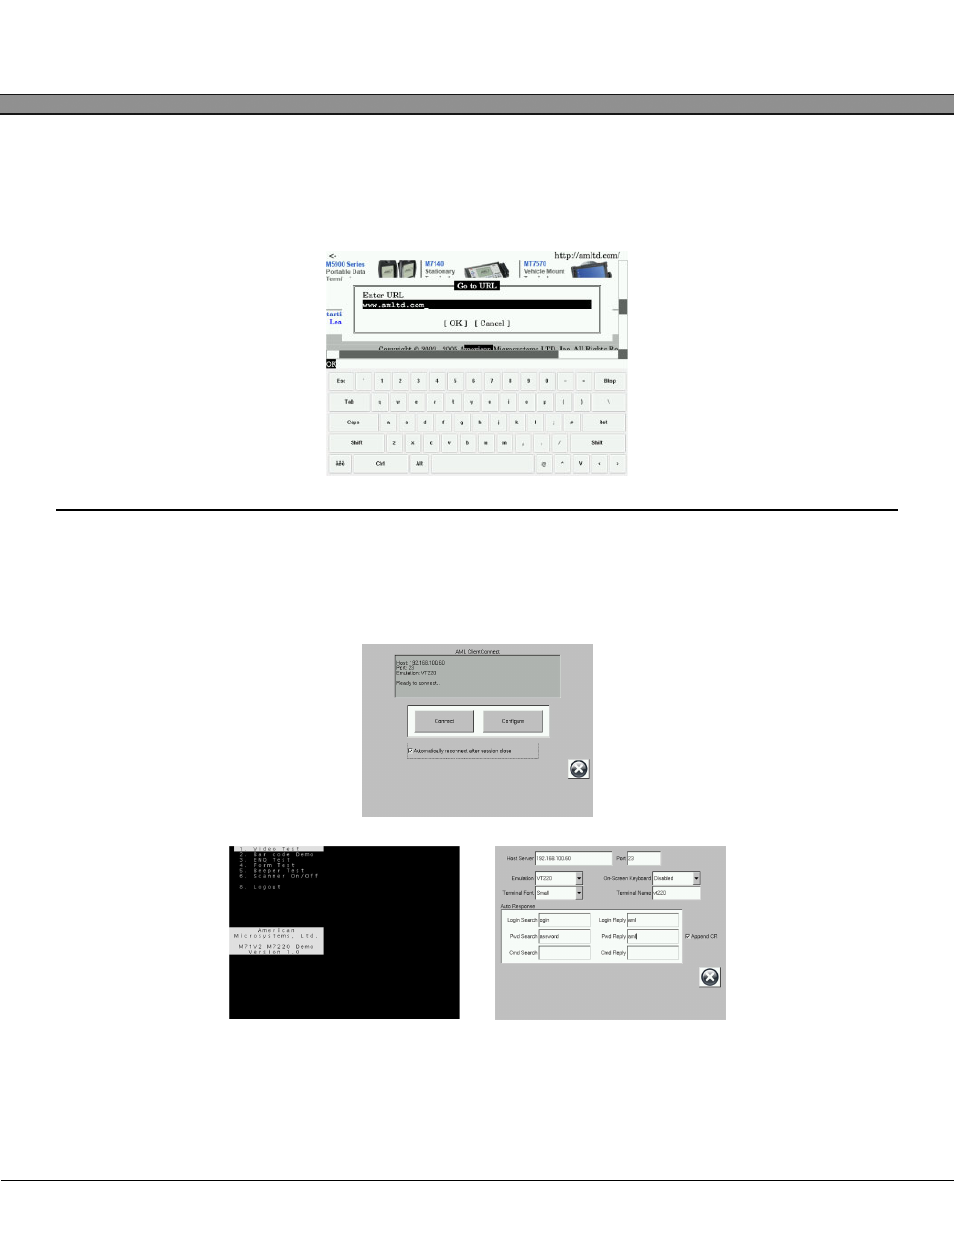 On-screen keyboard, Vt100/220 terminal emulator, Kdt750